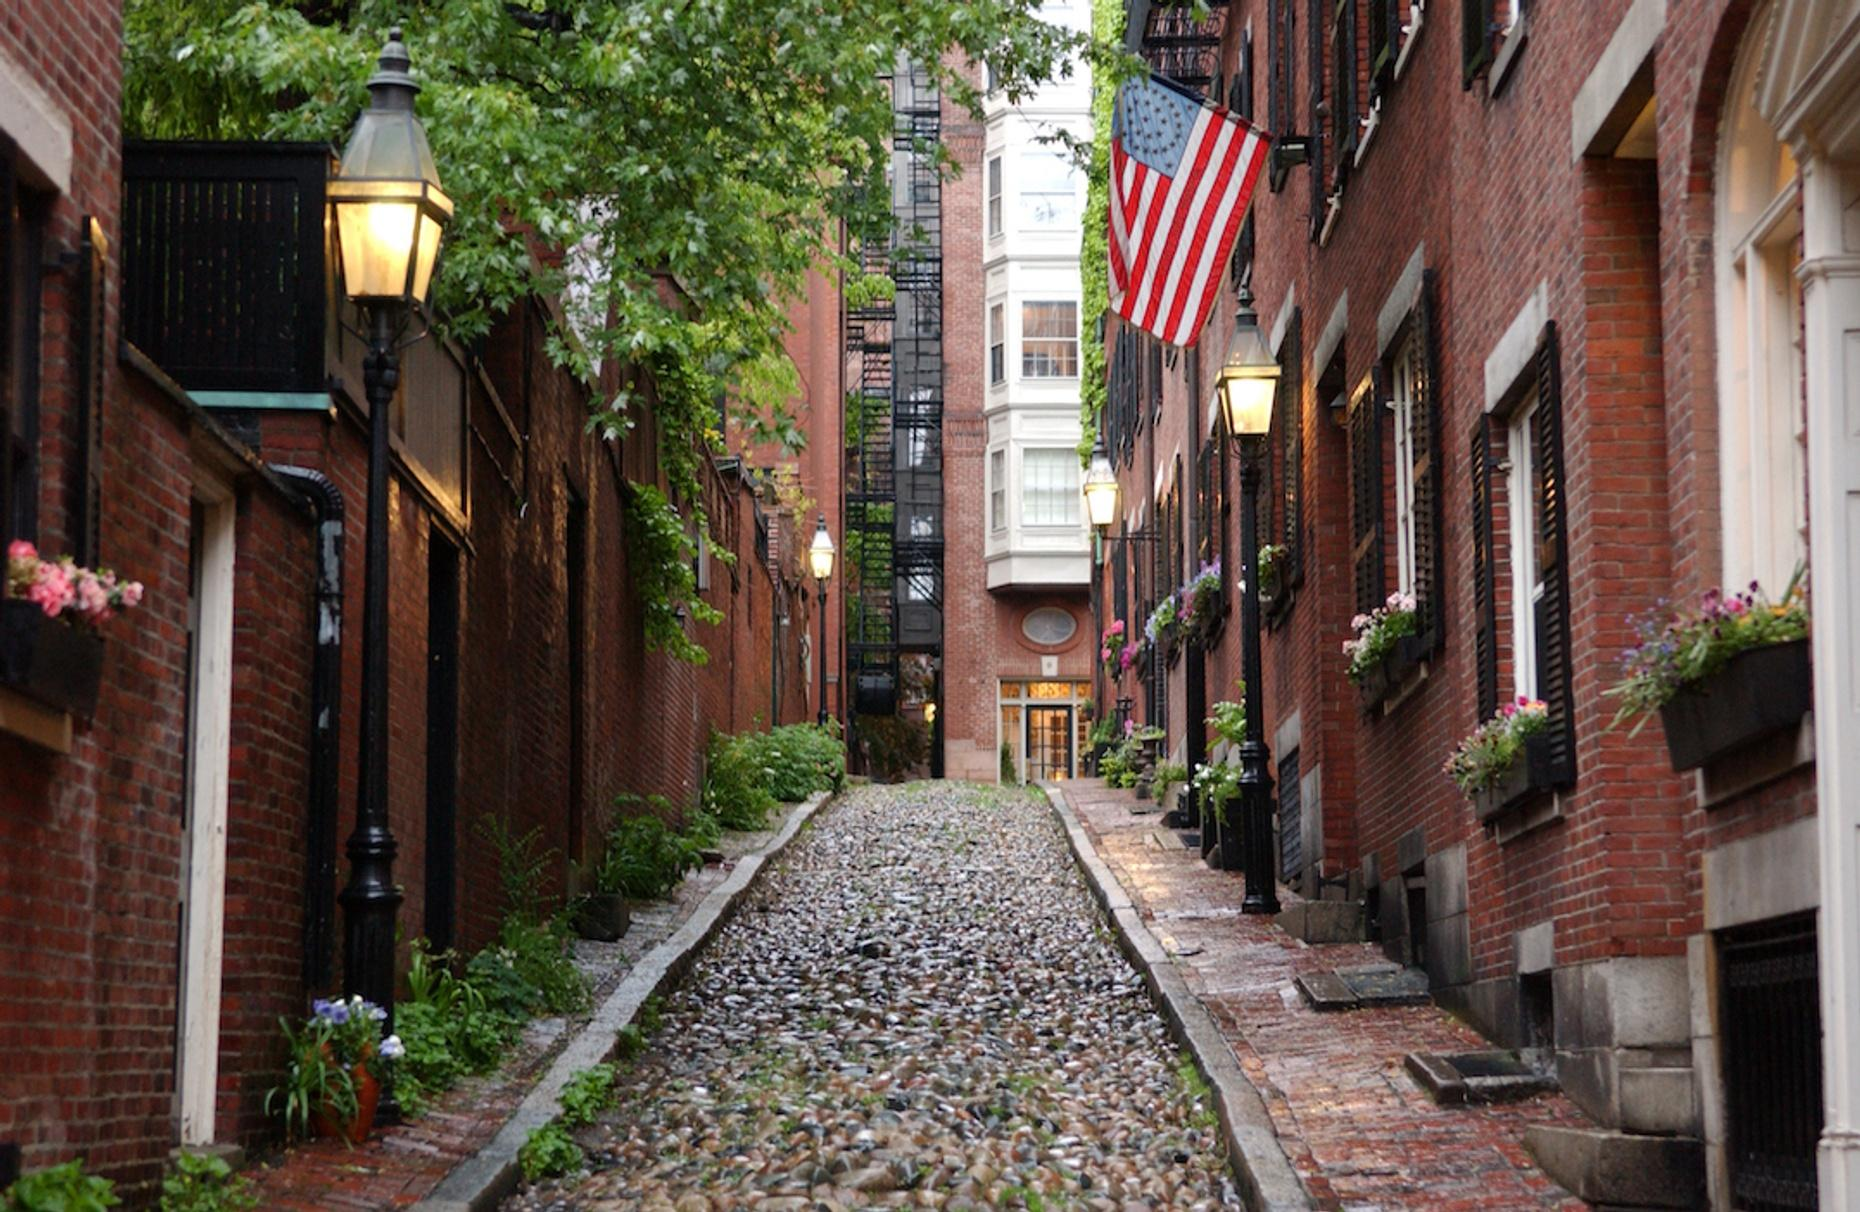 Acorn Street & Beacon Hill 5K Running Tour in Boston